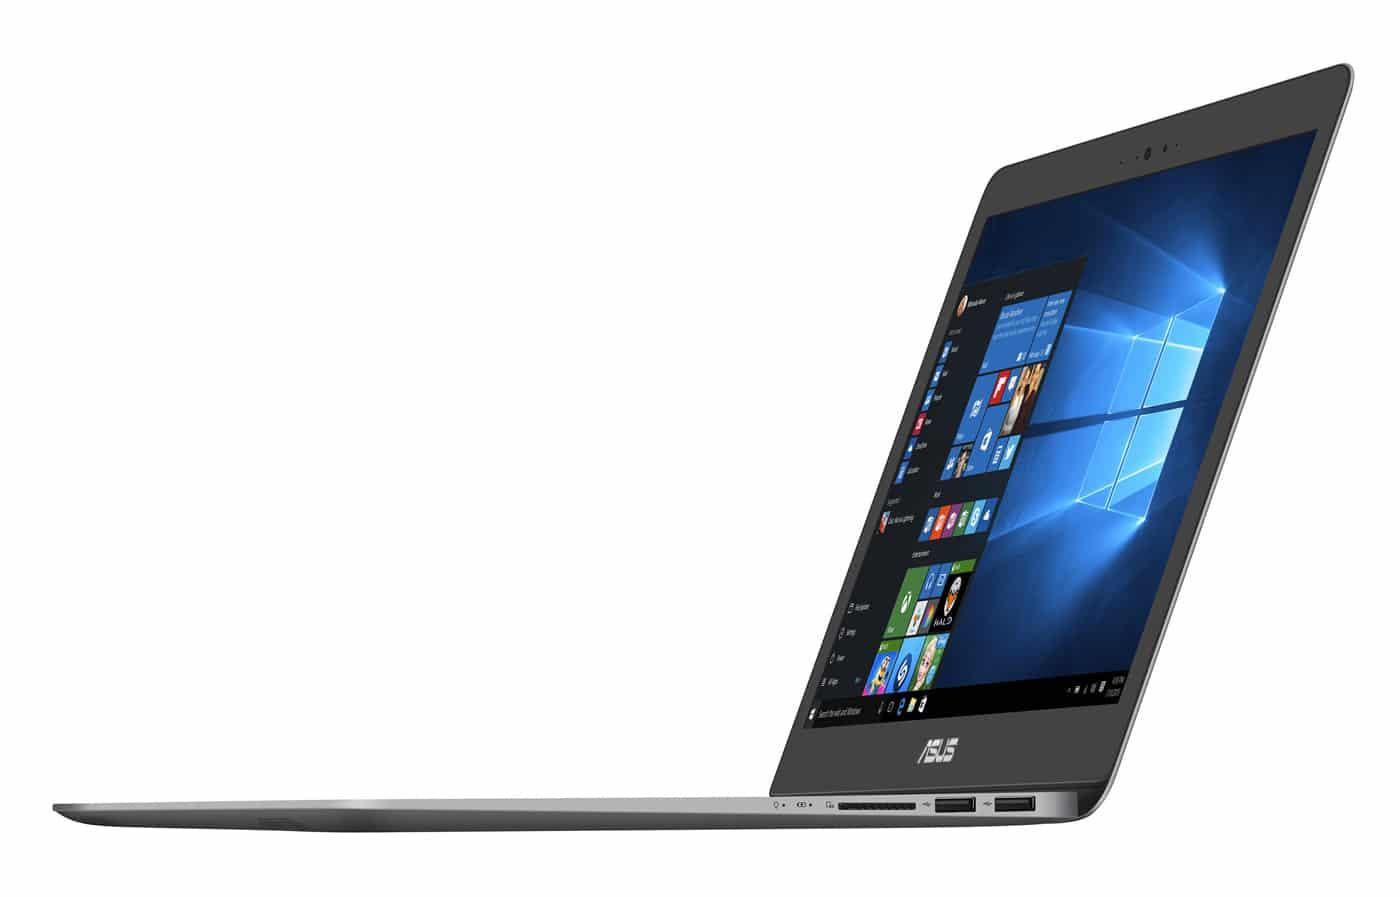 Asus Zenbook UX310UA-FC871T, ultrabook 13 pouces 16Go Full IPS i7 SSD à 999€